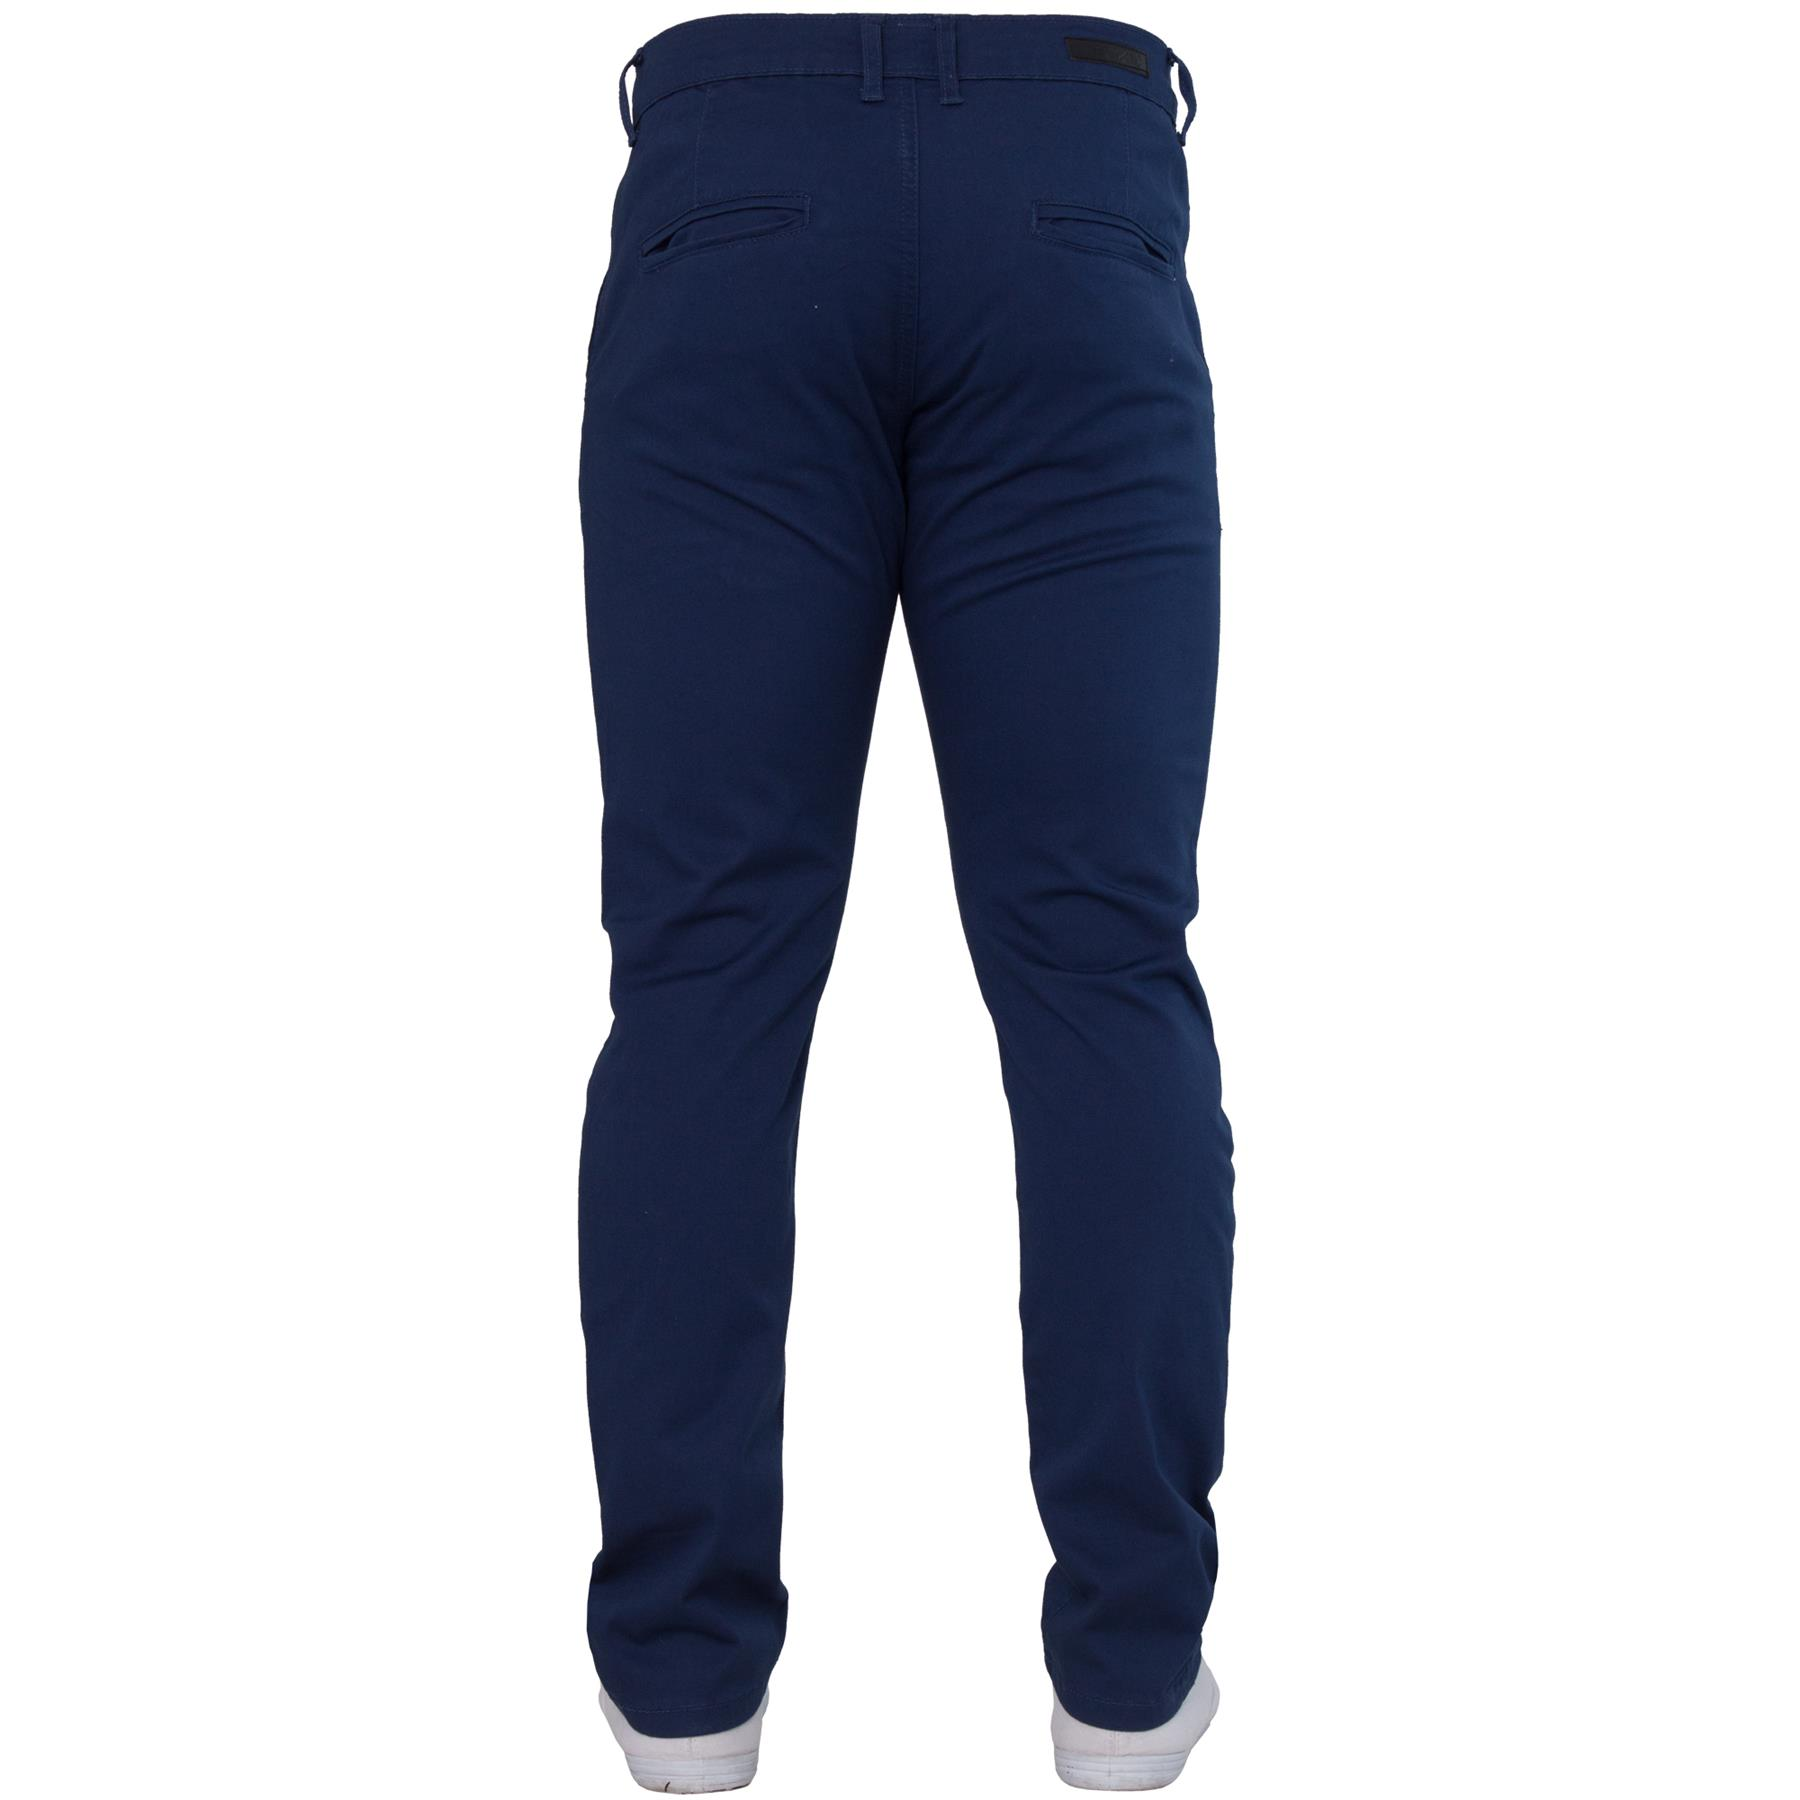 Enzo-Mens-Big-Tall-Jeans-Leg-King-Size-Denim-Pants-Chino-Trousers-Pants-44-034-60-034 thumbnail 7